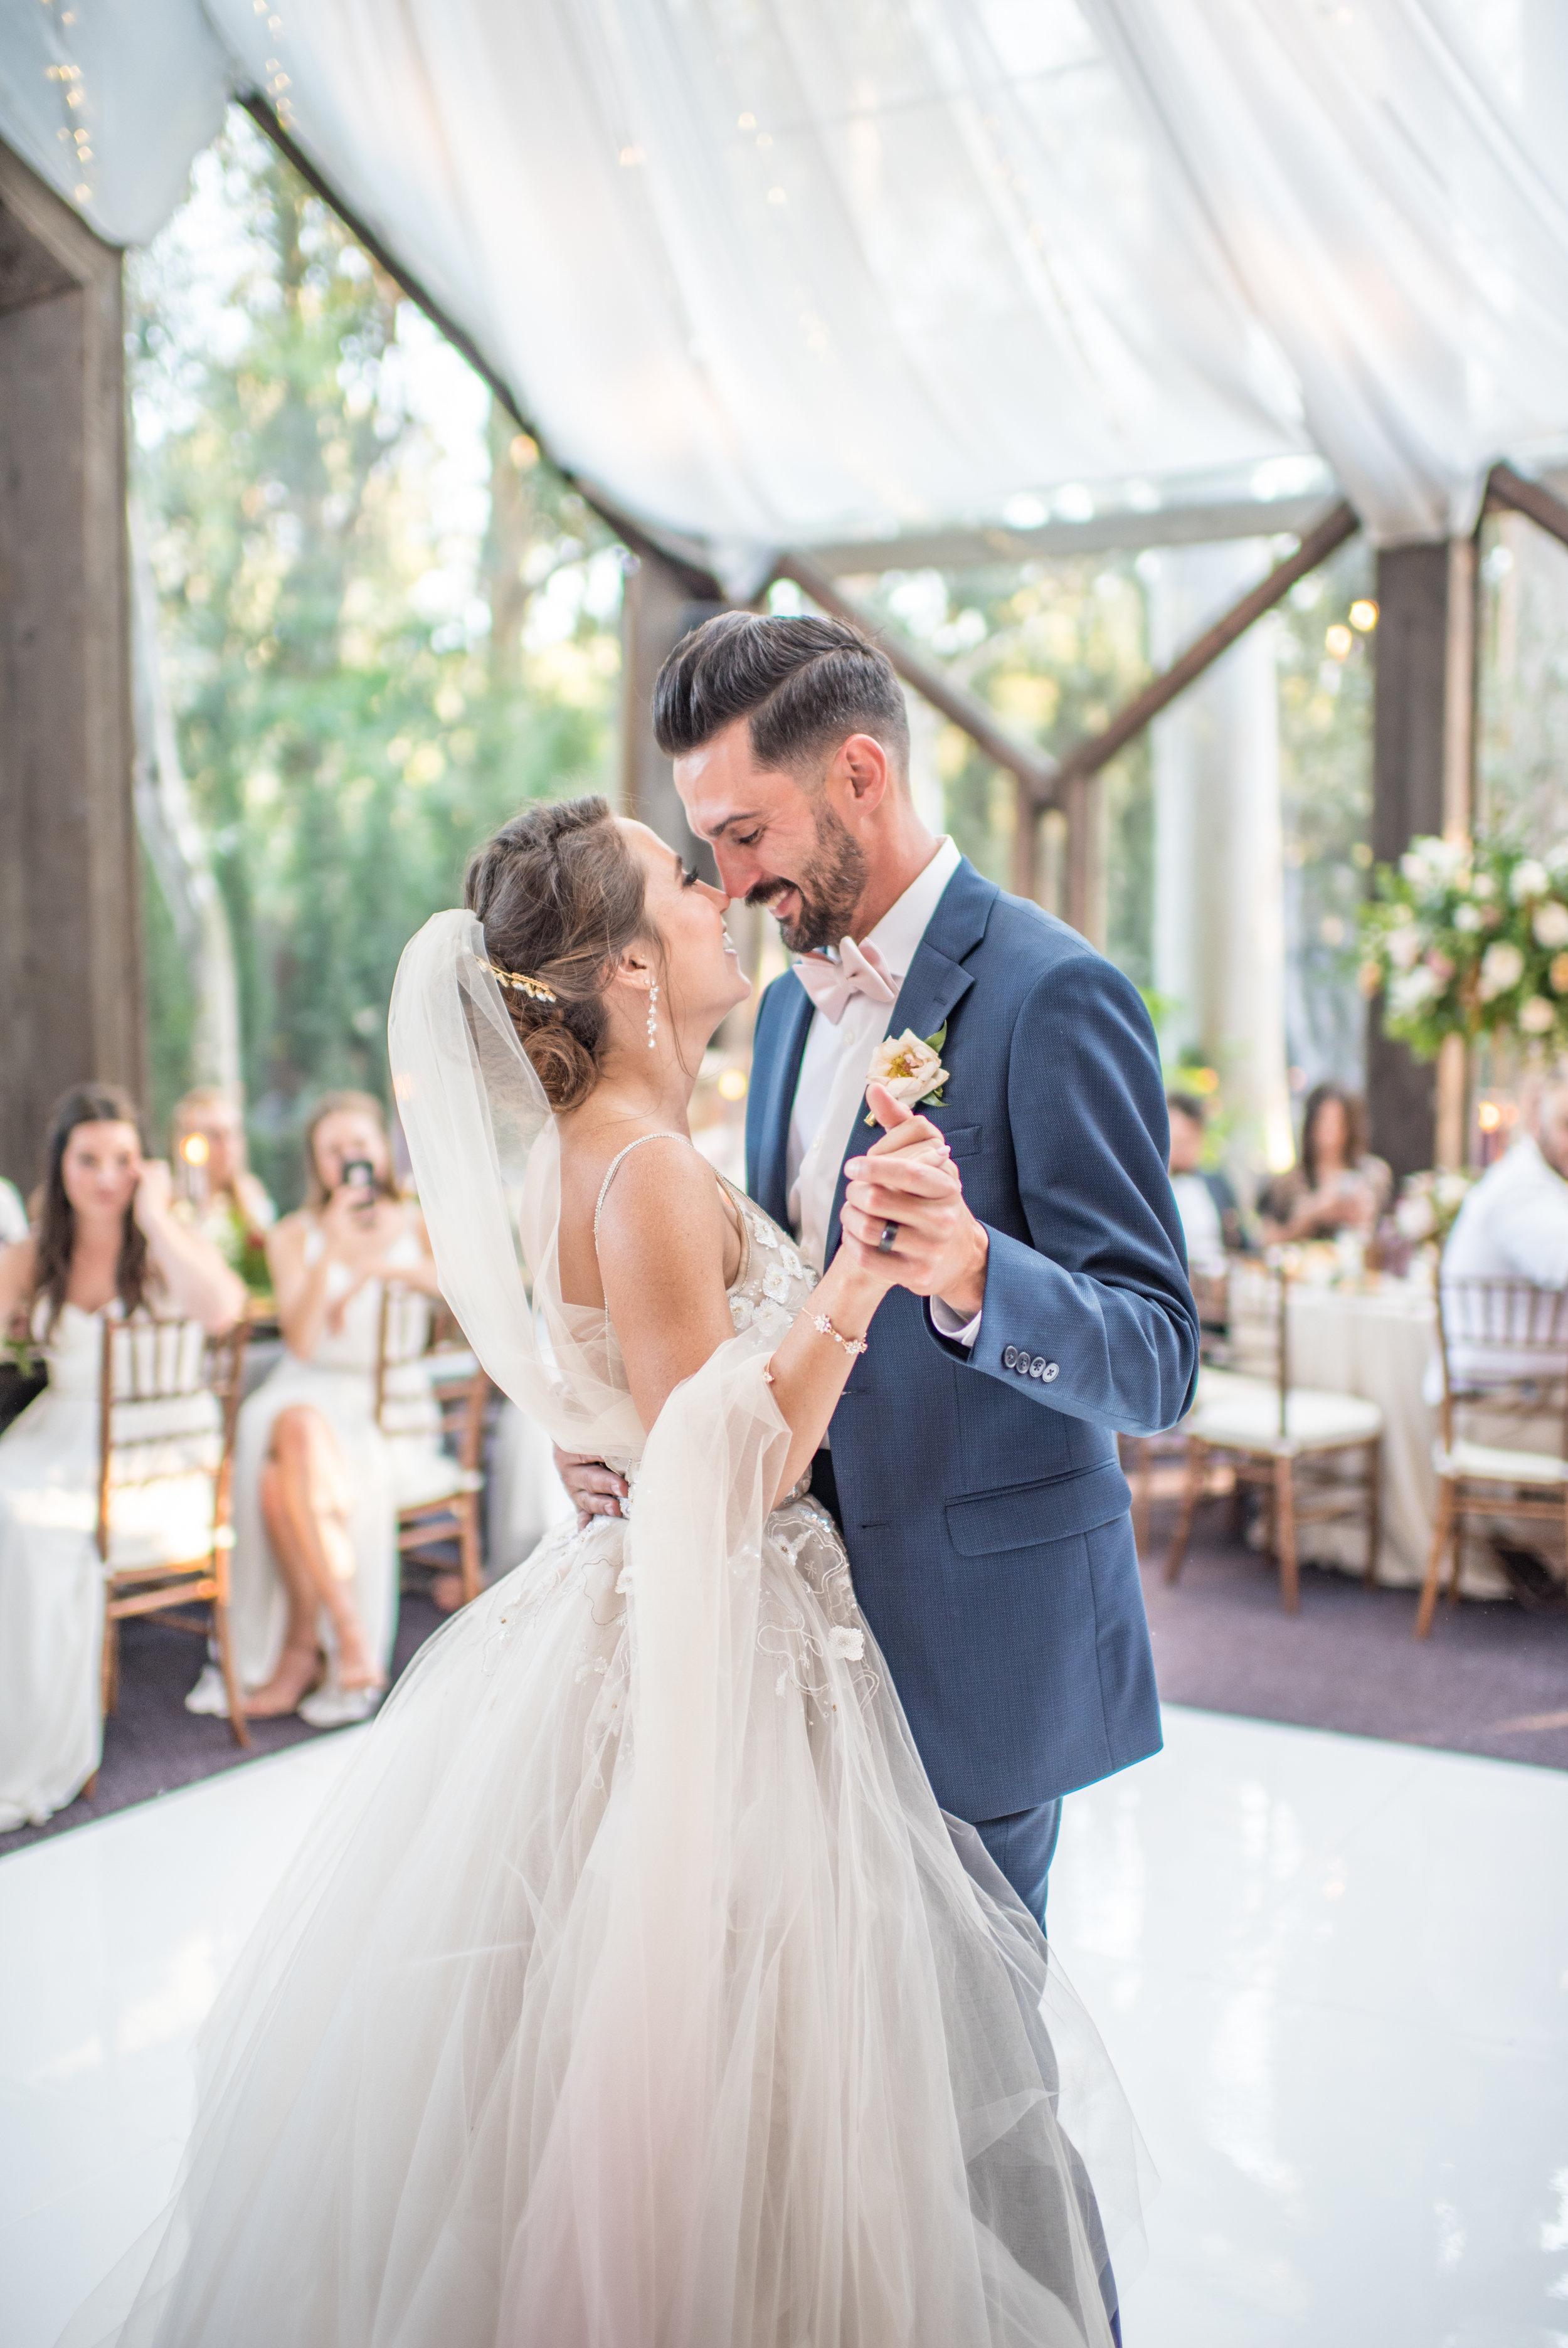 Destiny and Chad Malibu, CA Fairytale Wedding